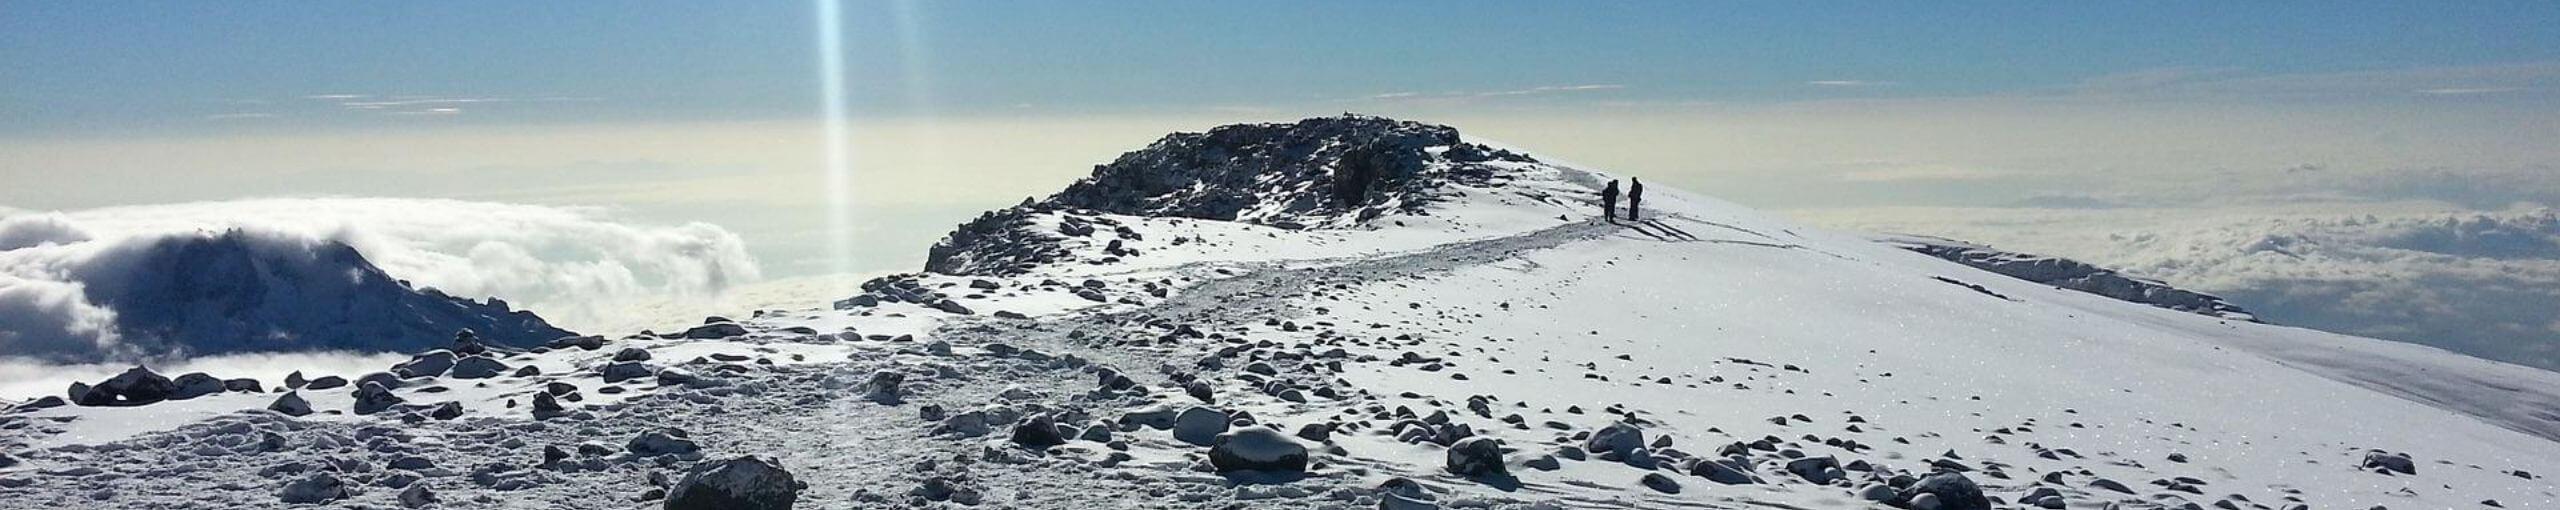 Trekking del Kilimanjaro. Tanzania.